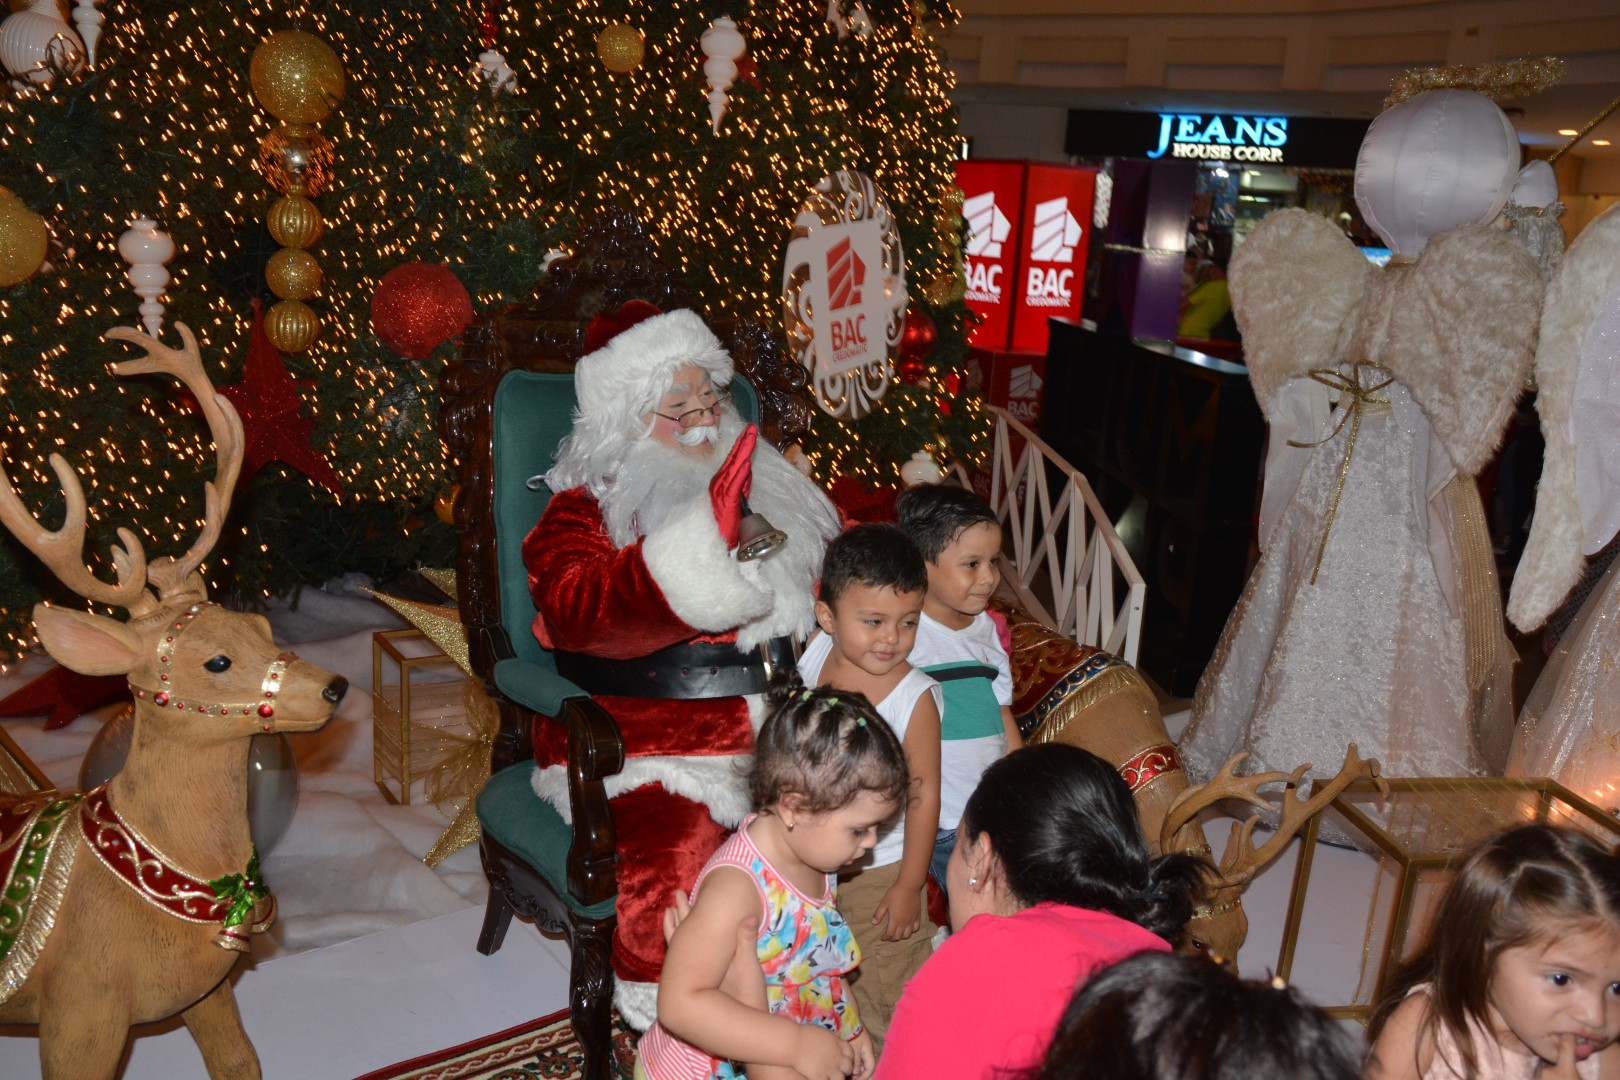 Multiplaza San Pedro Sula da la bienvenida a la temporada navideña